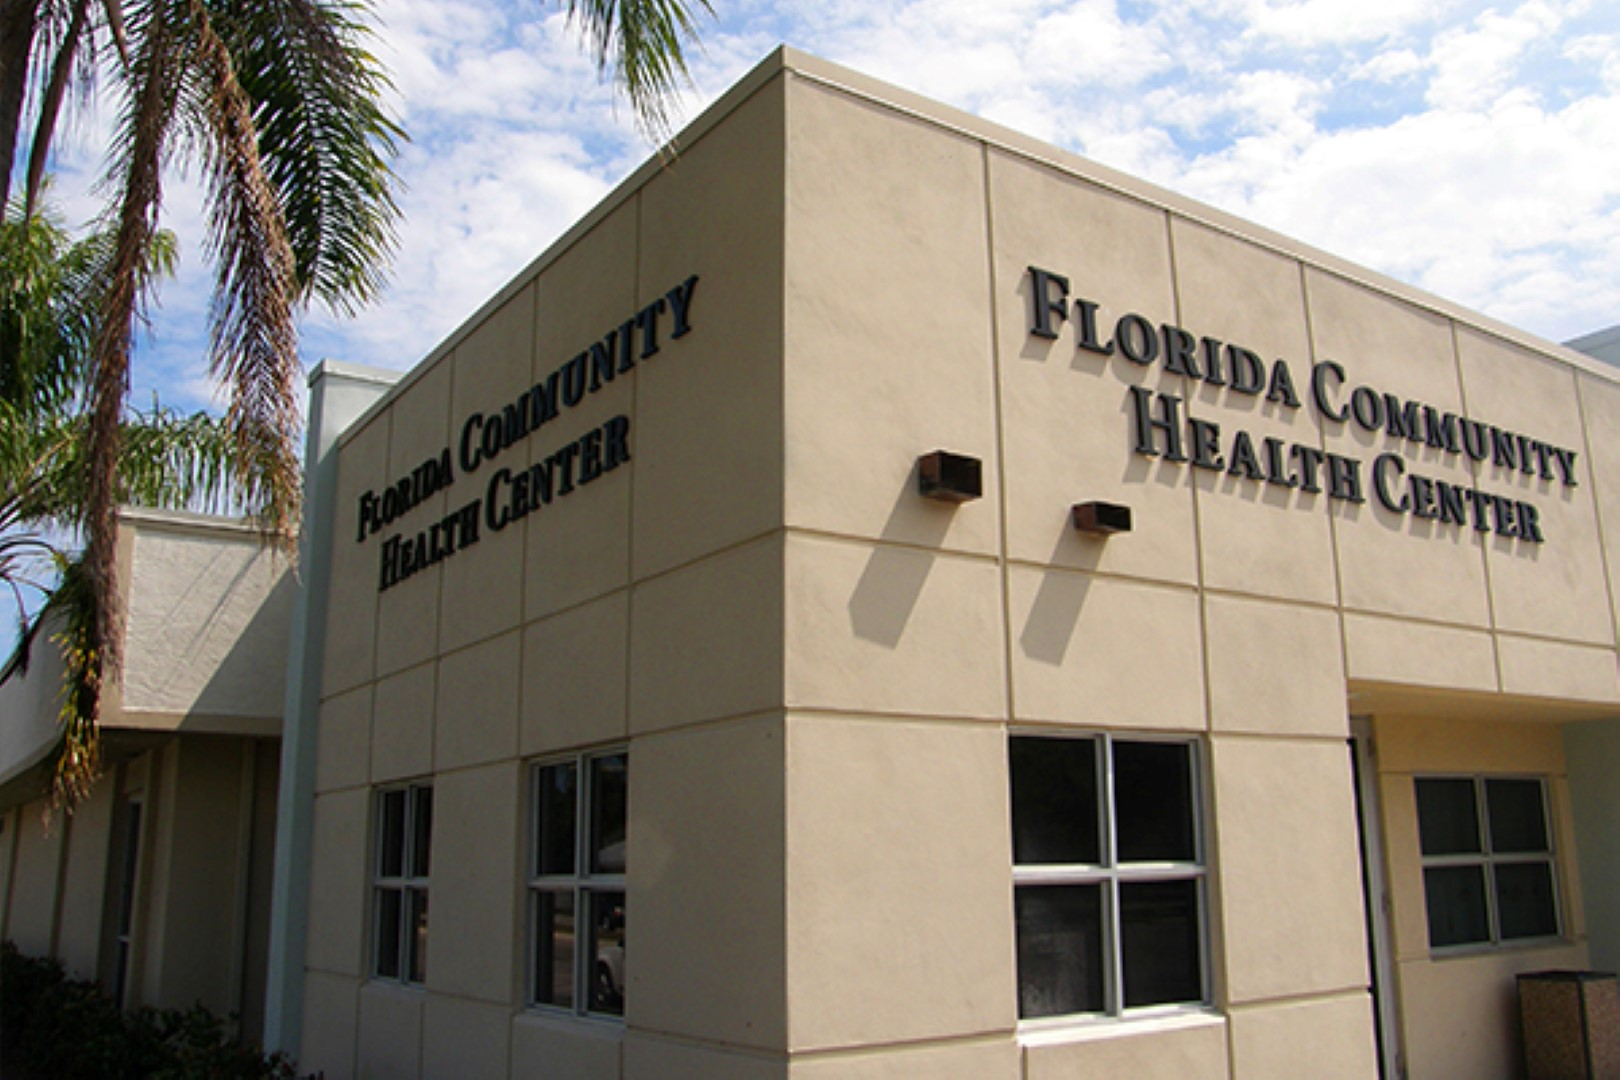 Florida-community-Health-Center-Large.jpg